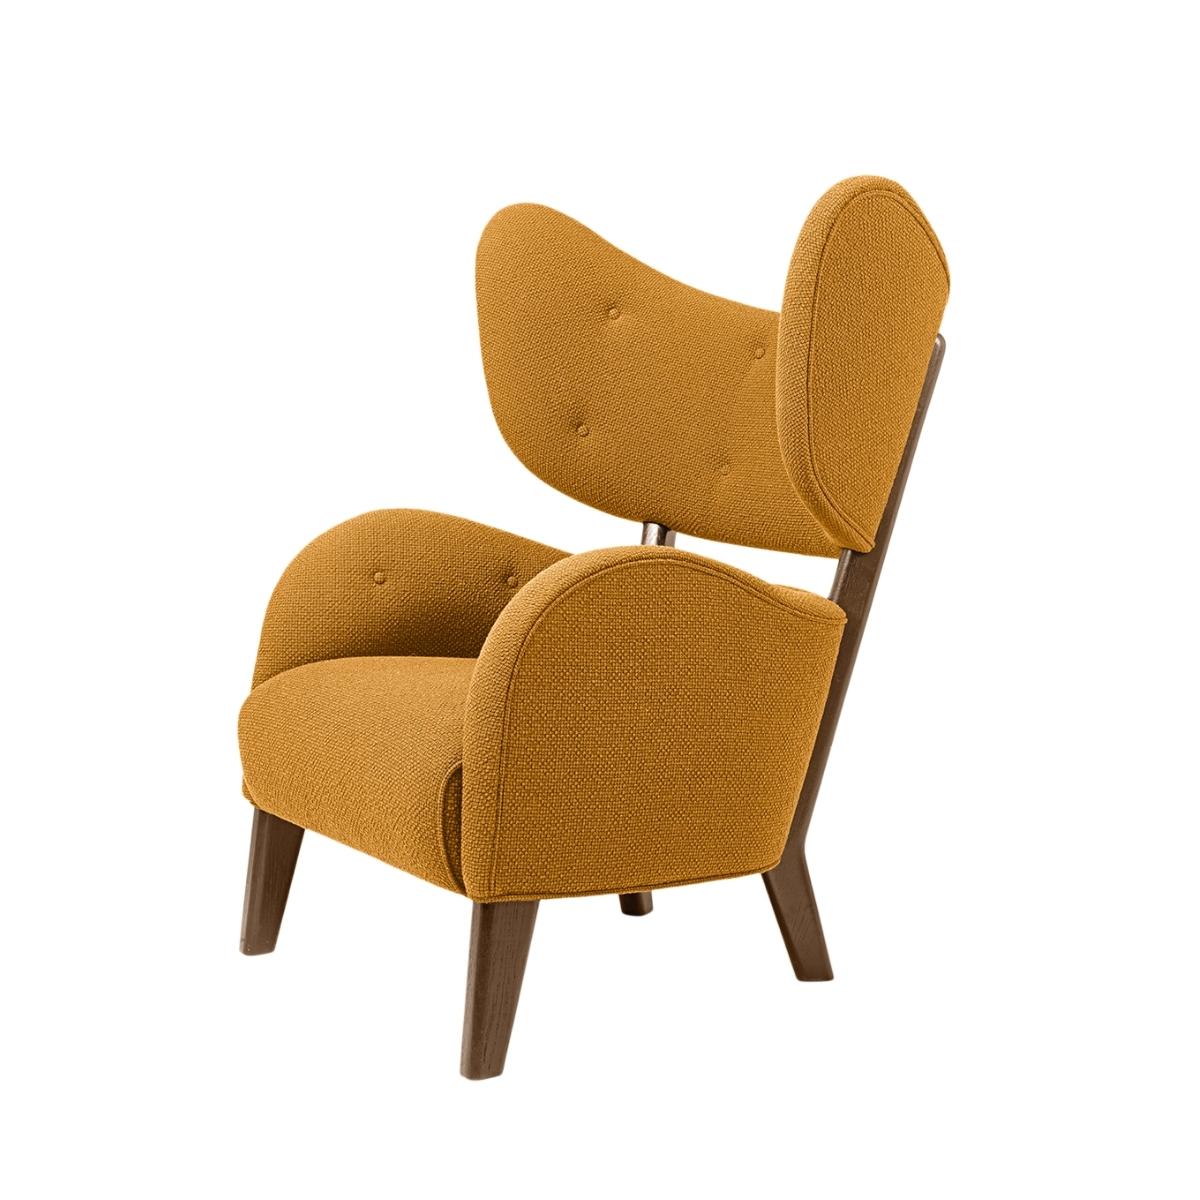 By Lassen | My Own Chair - Raf Simons - Bolighuset Werenberg